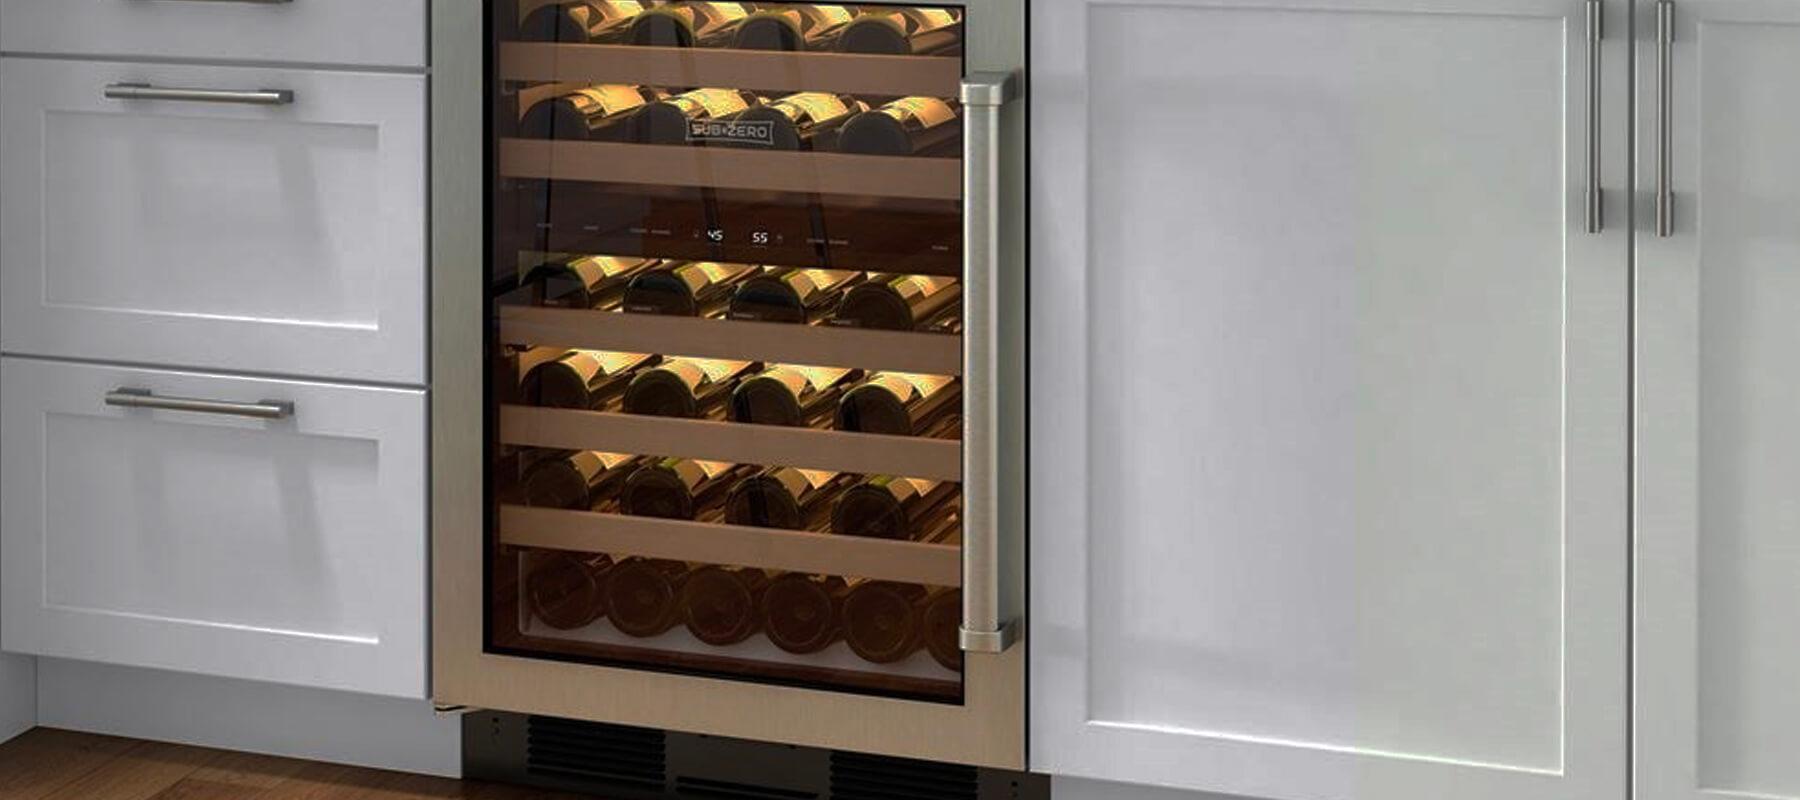 Built in Wine Refrigerator Undercounter San Diego   Built-in Refrigerator Repair